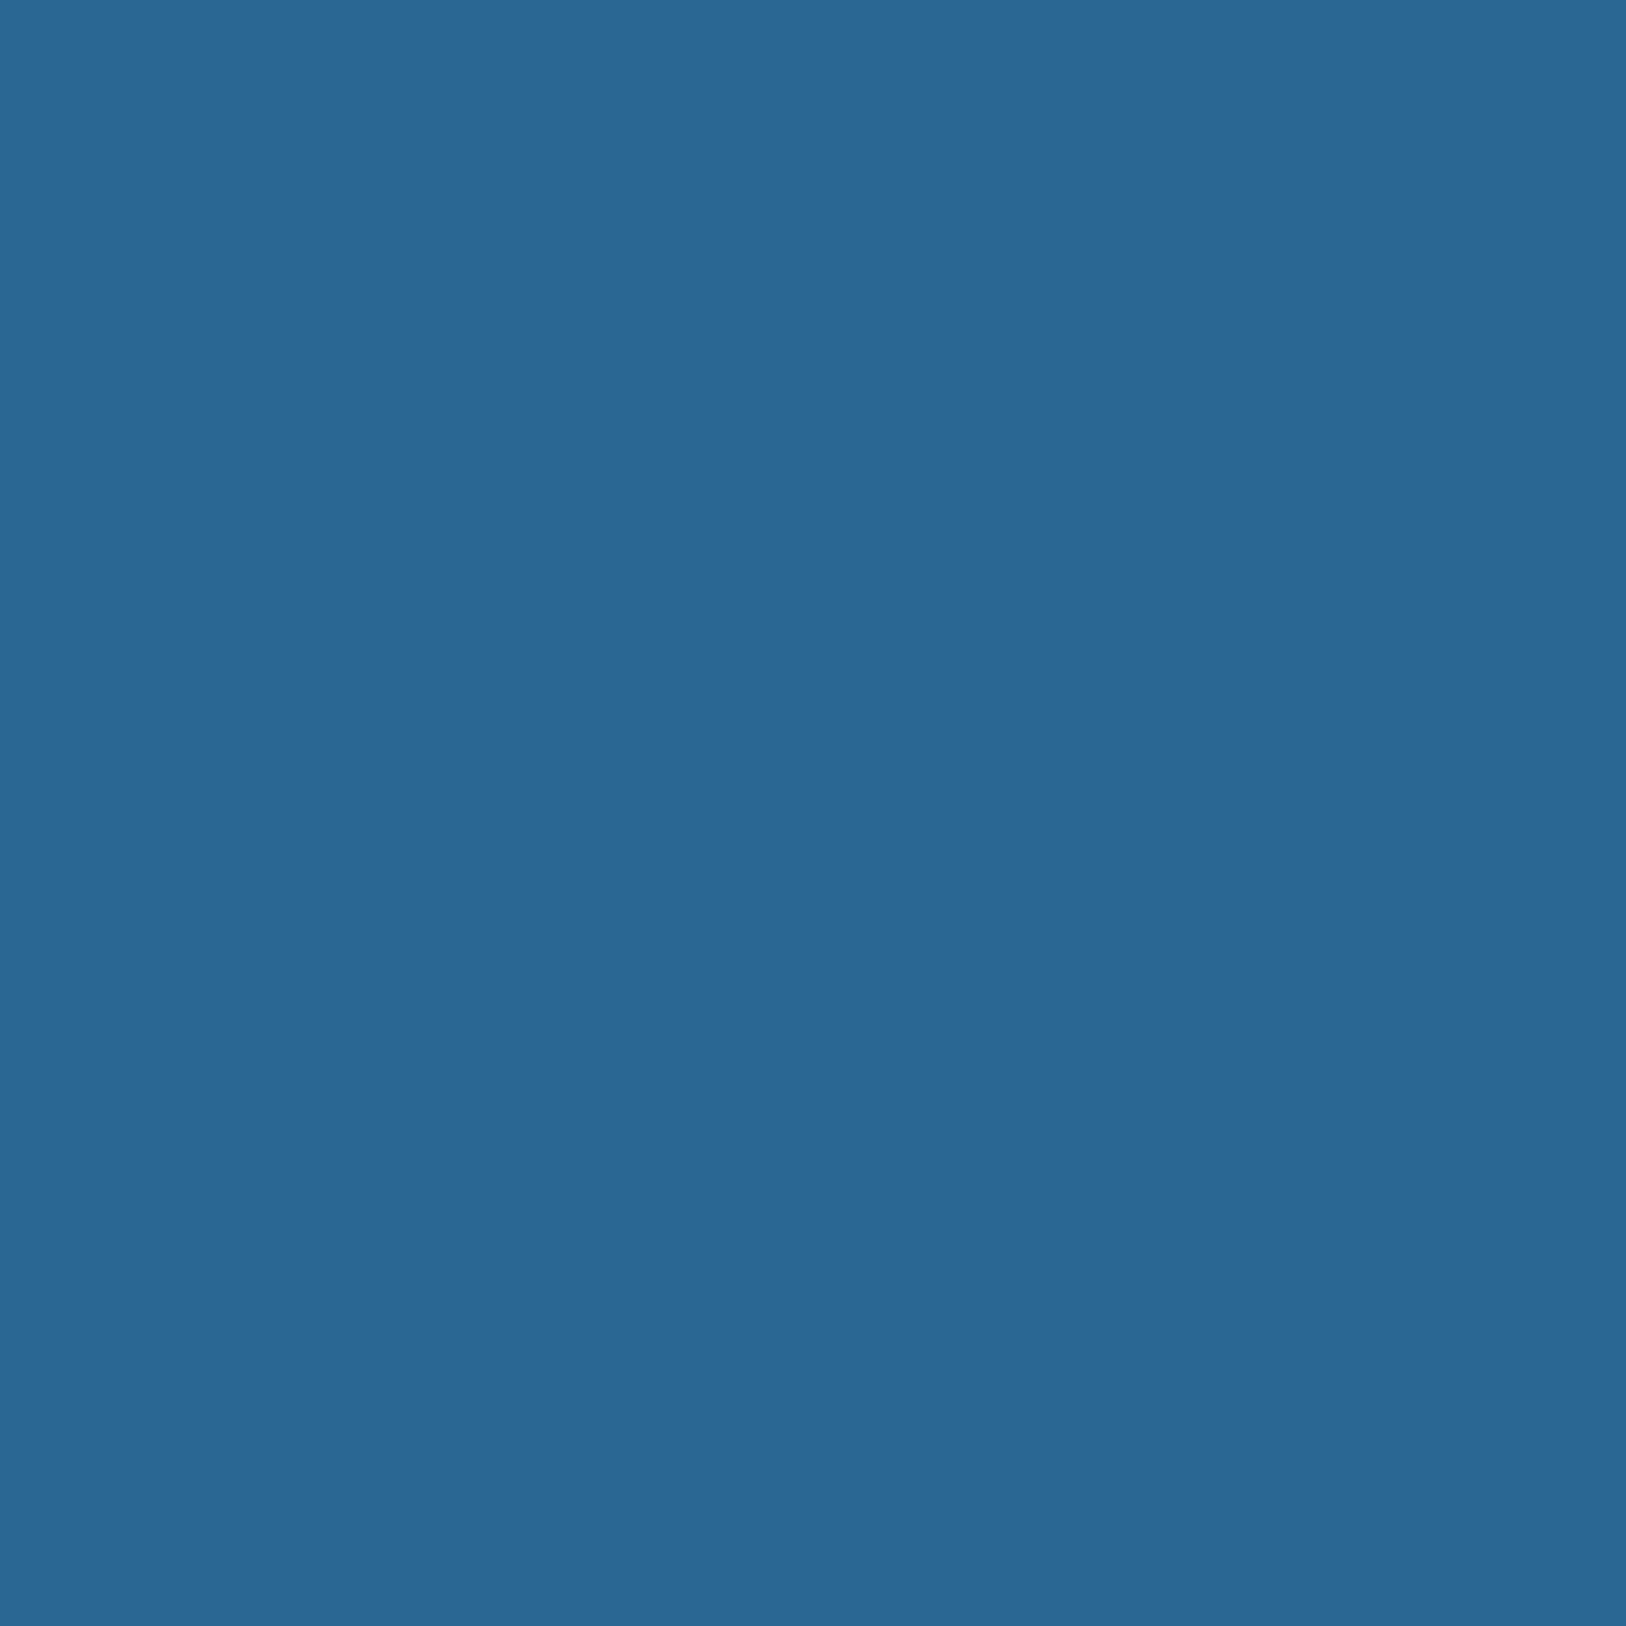 Bacau Plain Blue Wallpaper